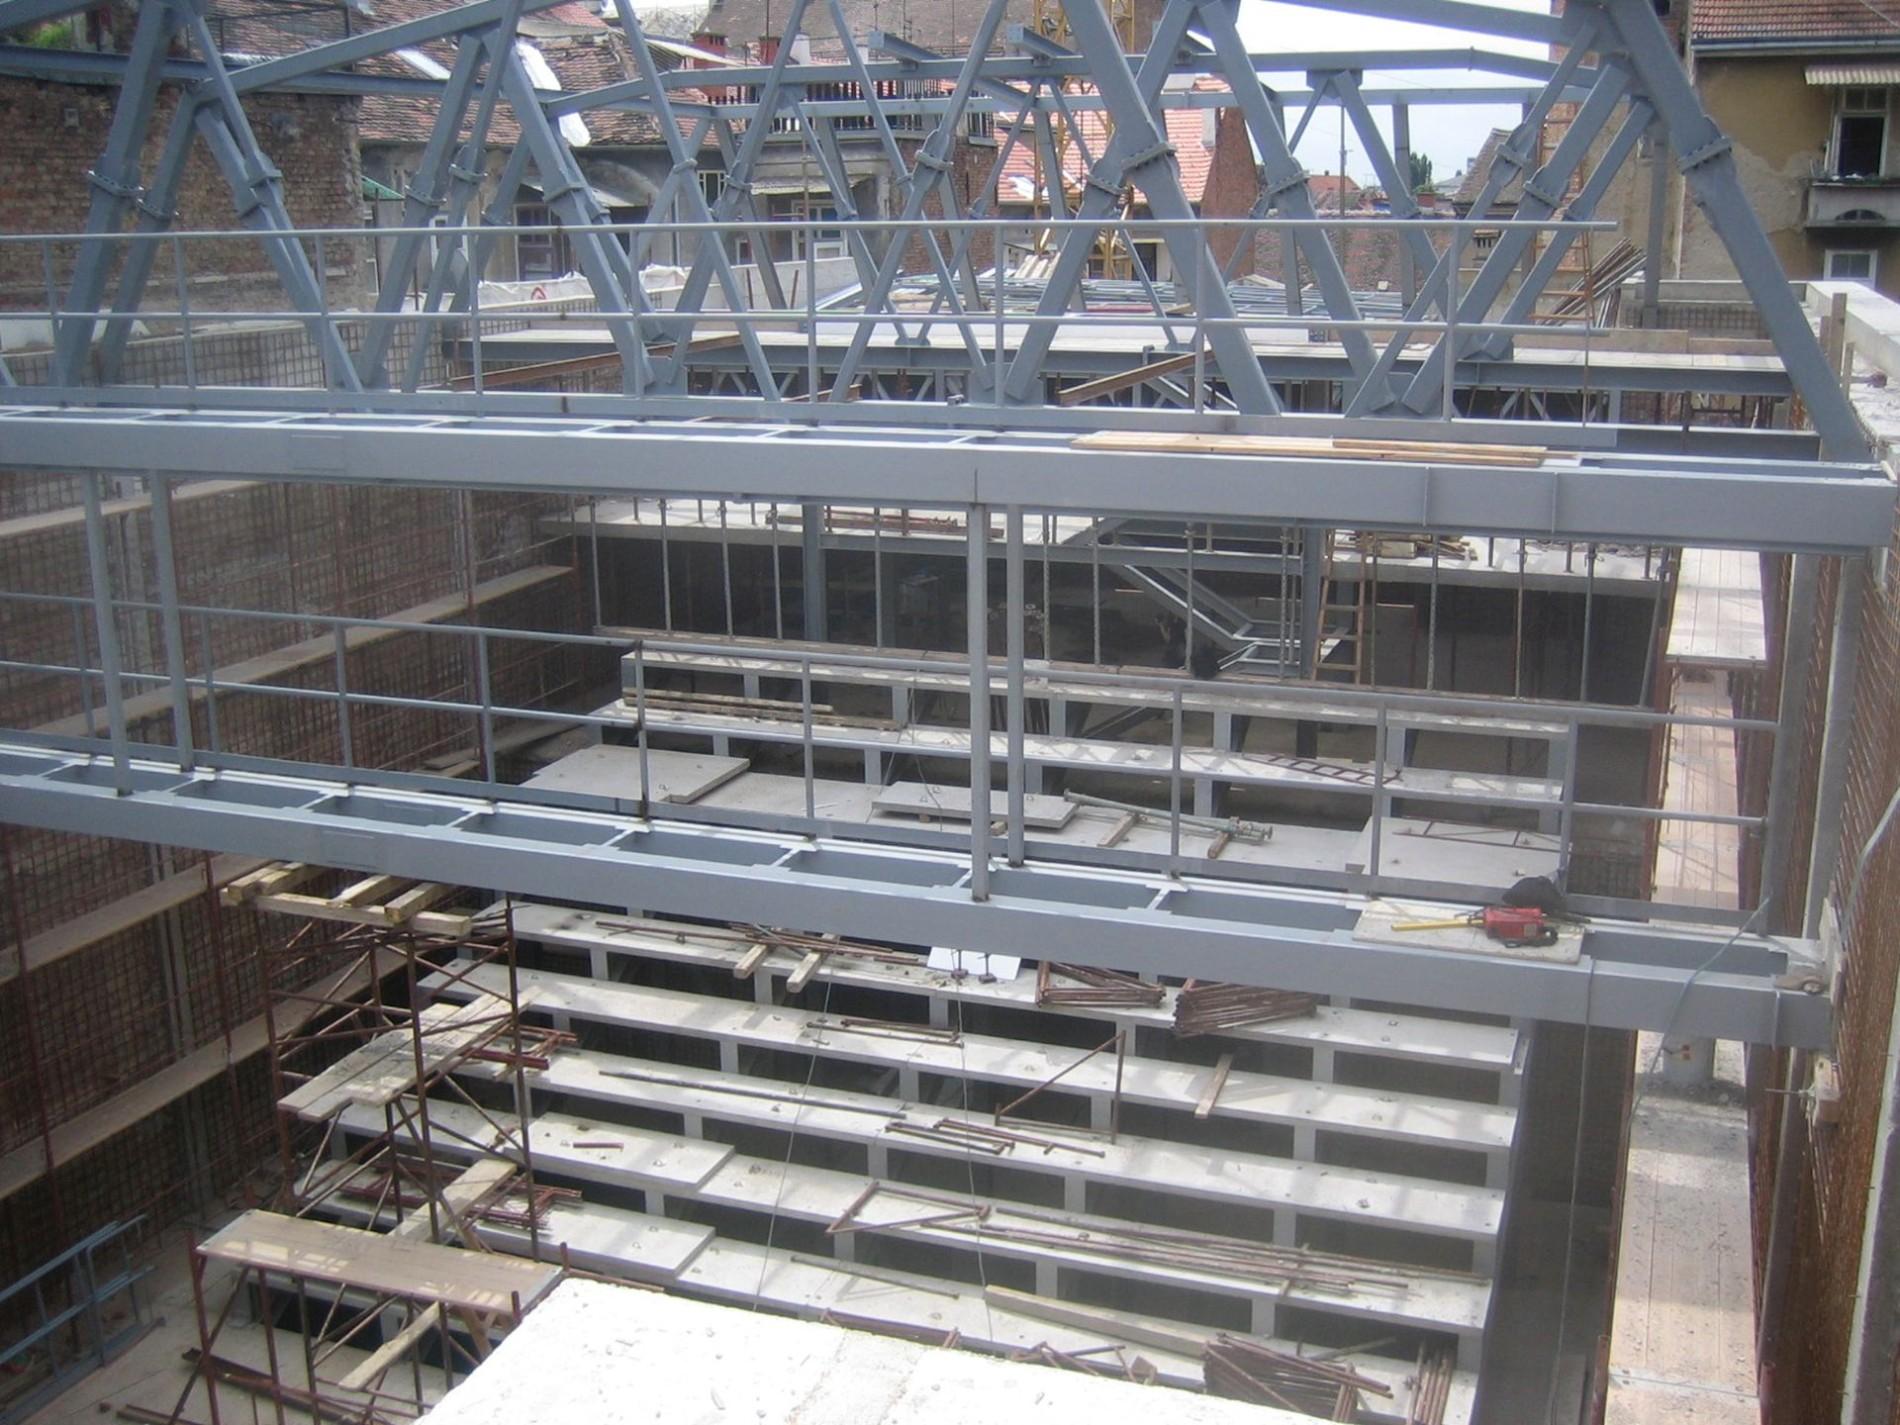 apolo, upi-2m, upi2m, konstrukcija, construction, čelik, steel, structure, 3lhd, cinema apolo, kino apolo